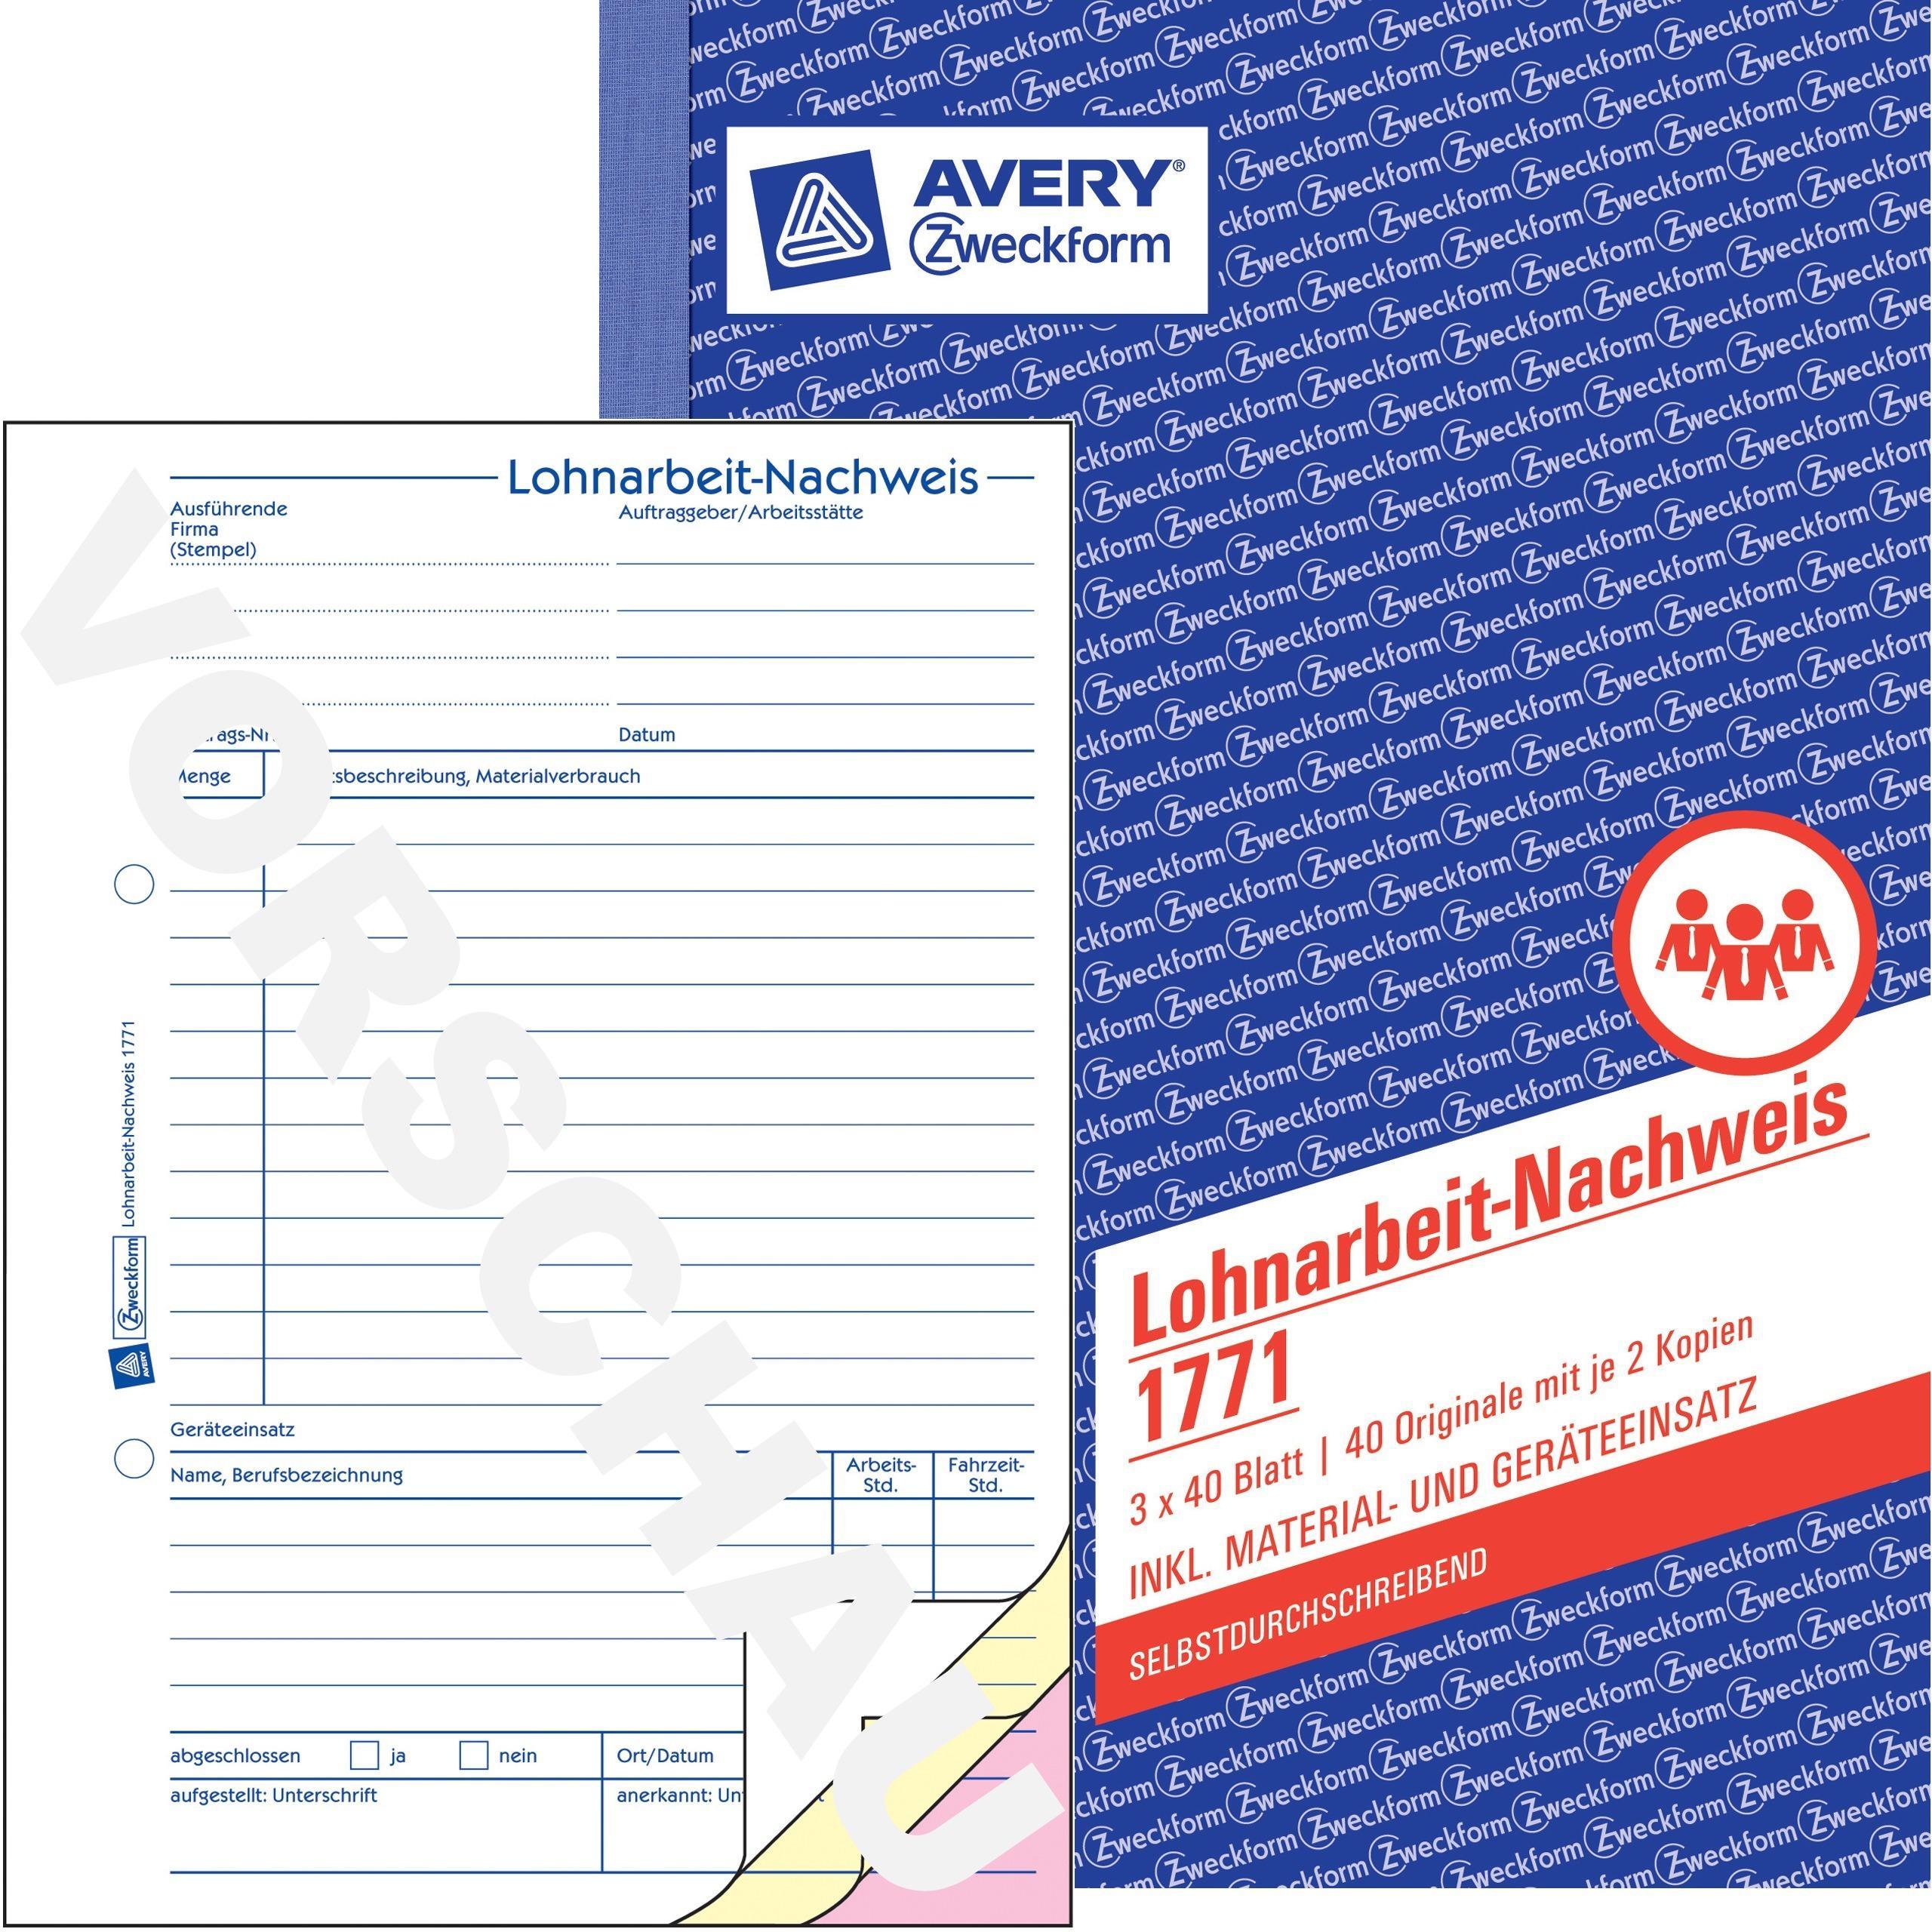 5x Zweckform Kassenbuch 1756 A4 nach Steuerschiene 300 je Buch 2x40 Blatt AVERY